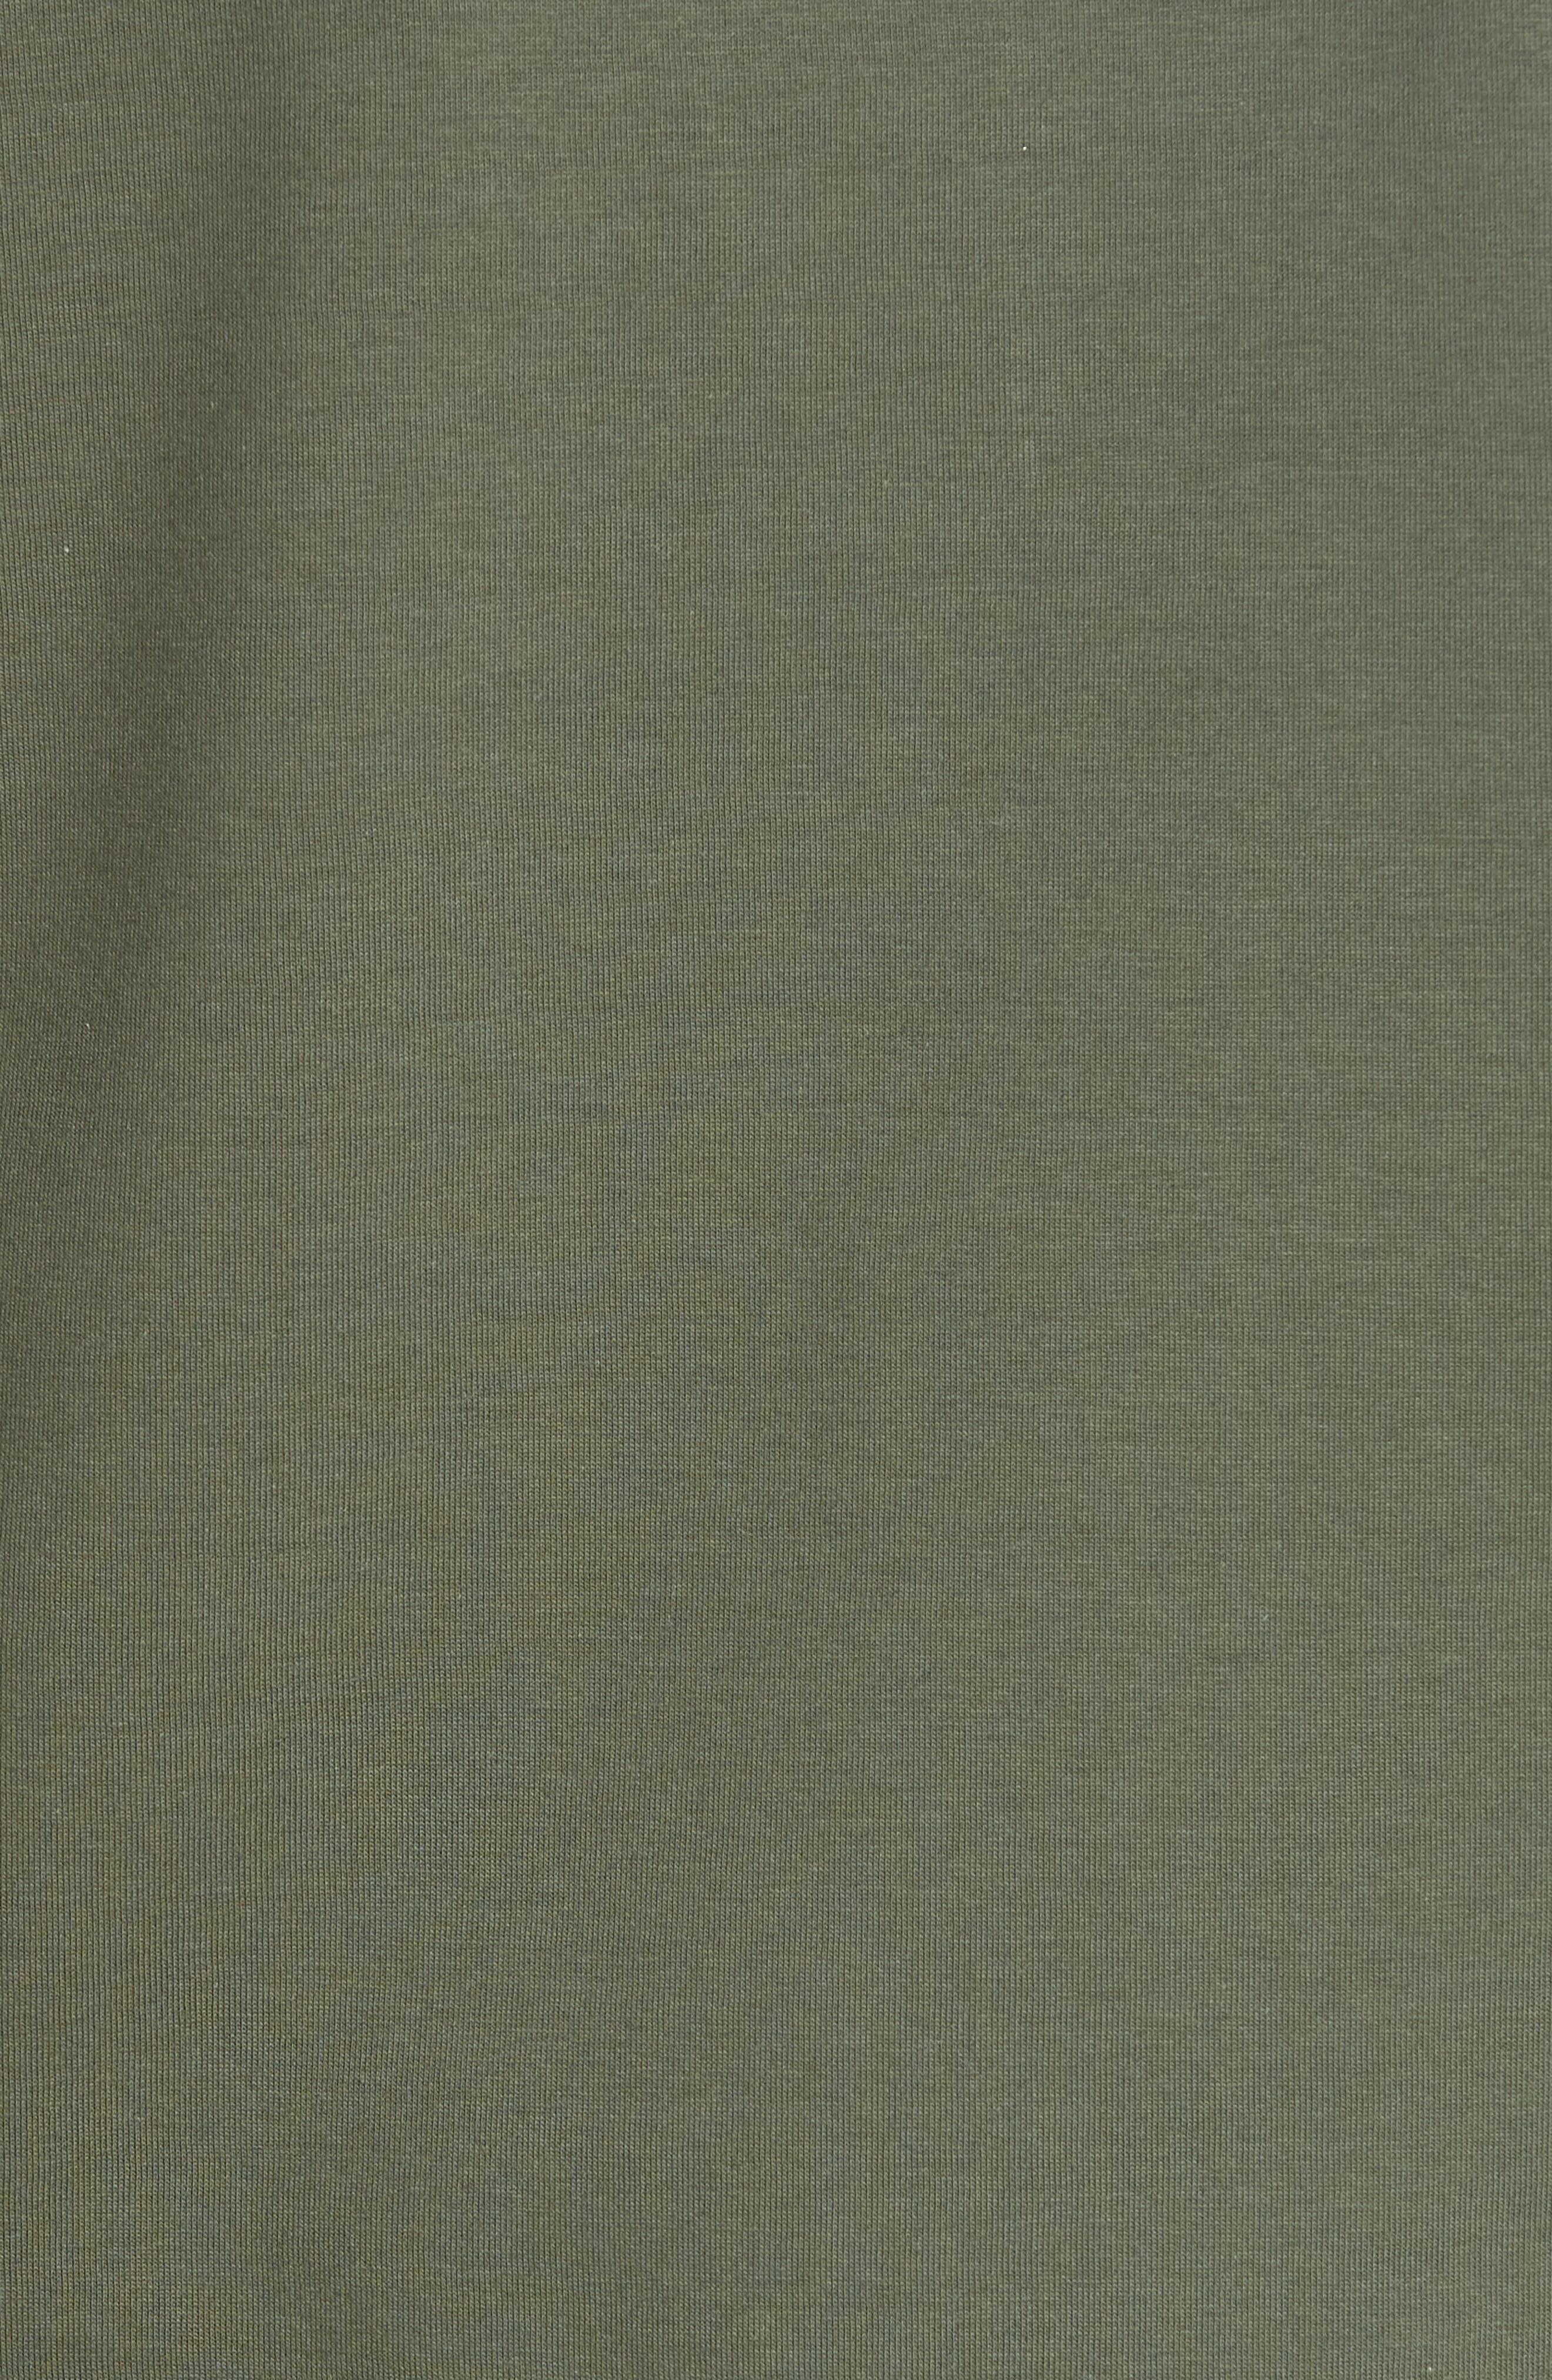 Abileen Fly Away Embroidered Sweatshirt,                             Alternate thumbnail 5, color,                             Khaki